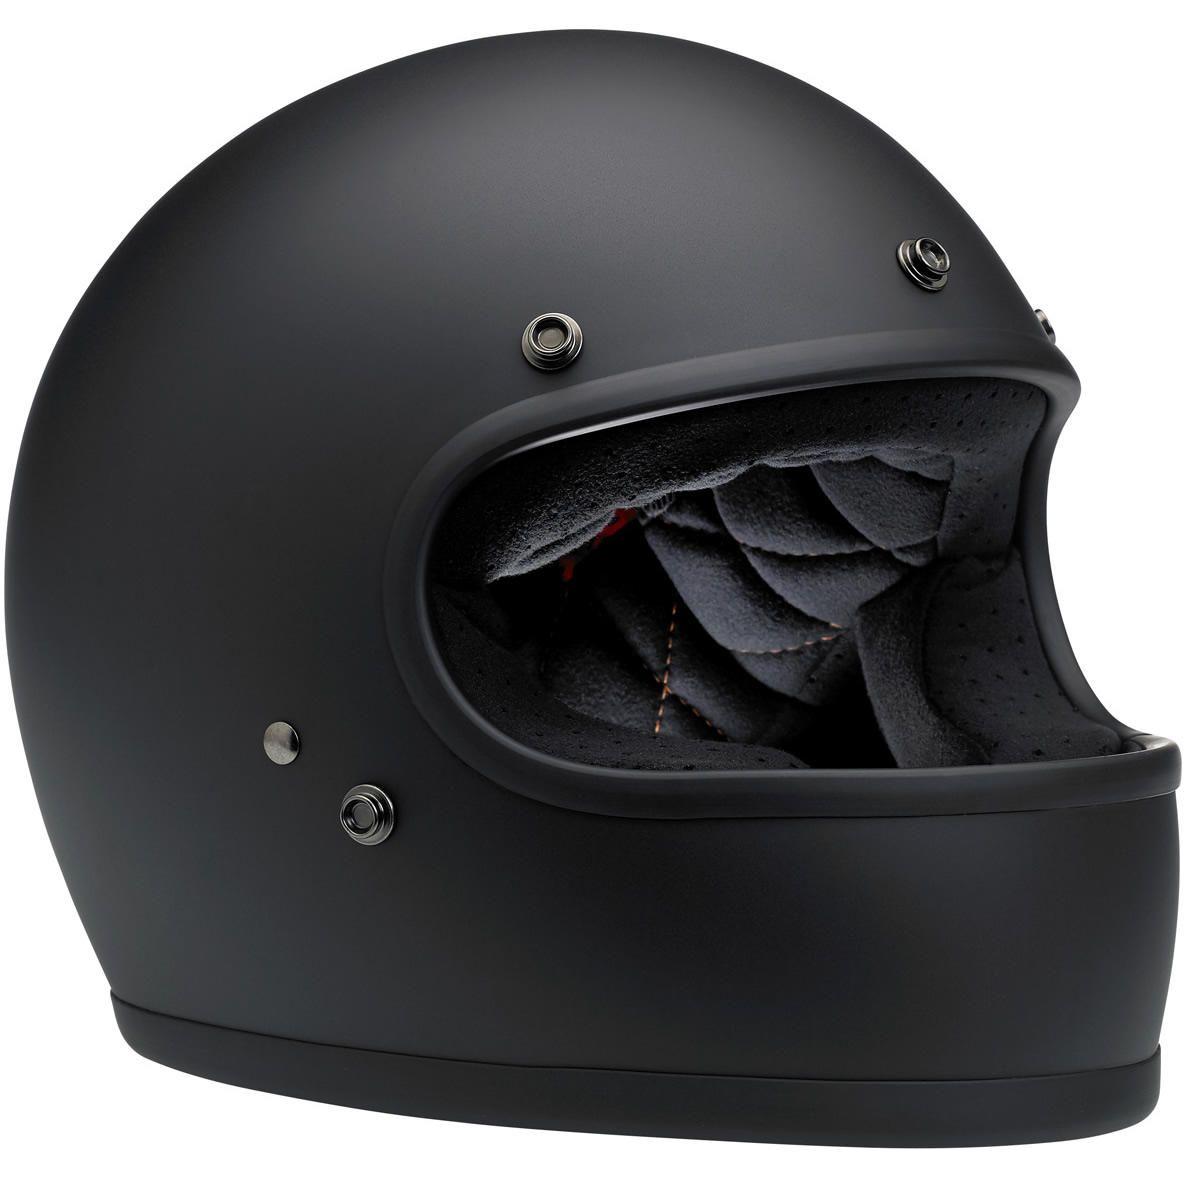 Pin By Spider On Cafe Full Face Helmets Motorcycle Helmets Vintage Retro Helmet